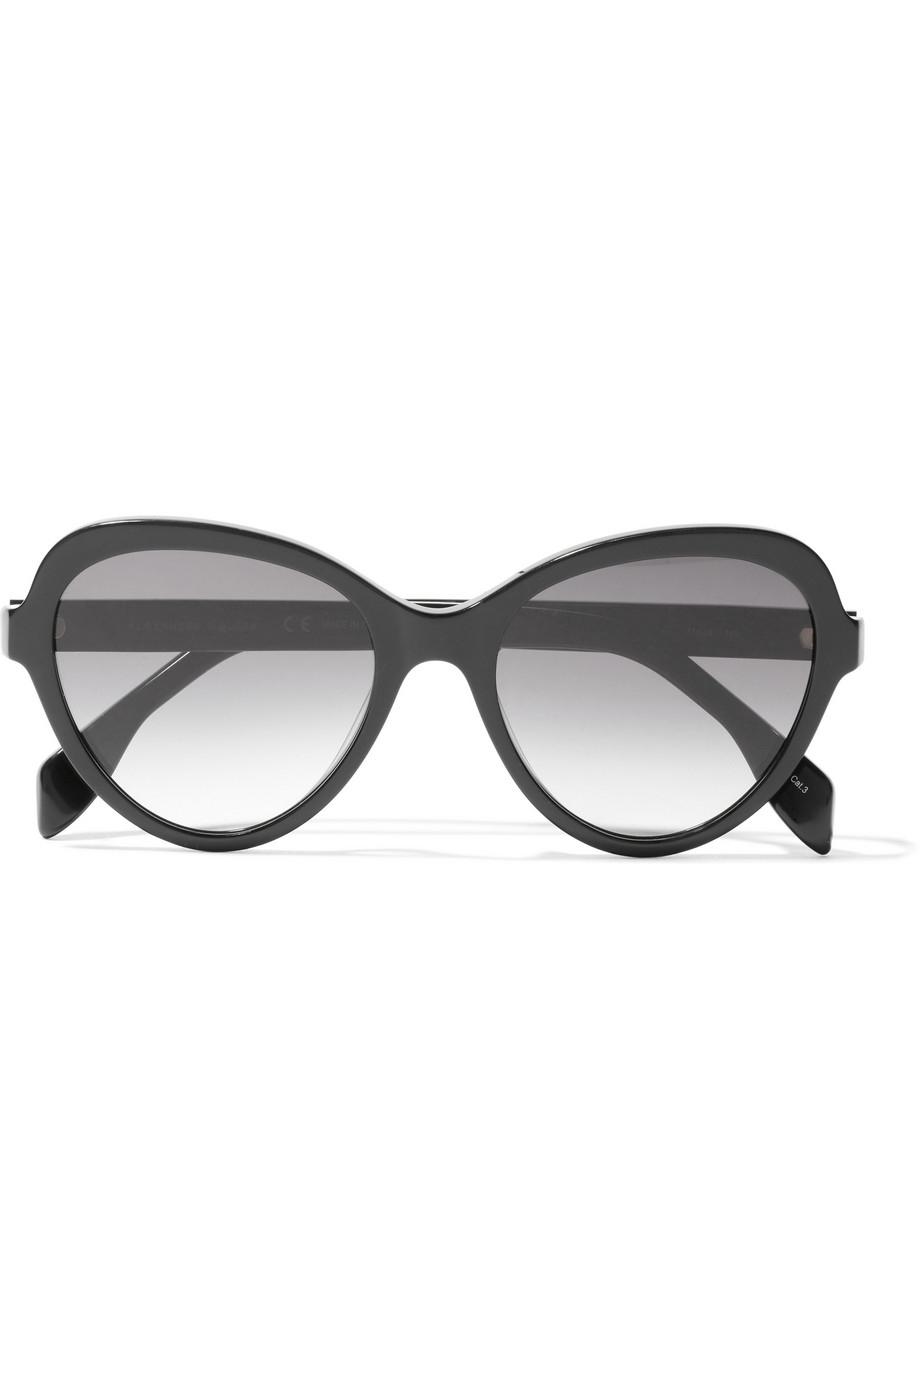 butterfly glasses frames louisiana brigade